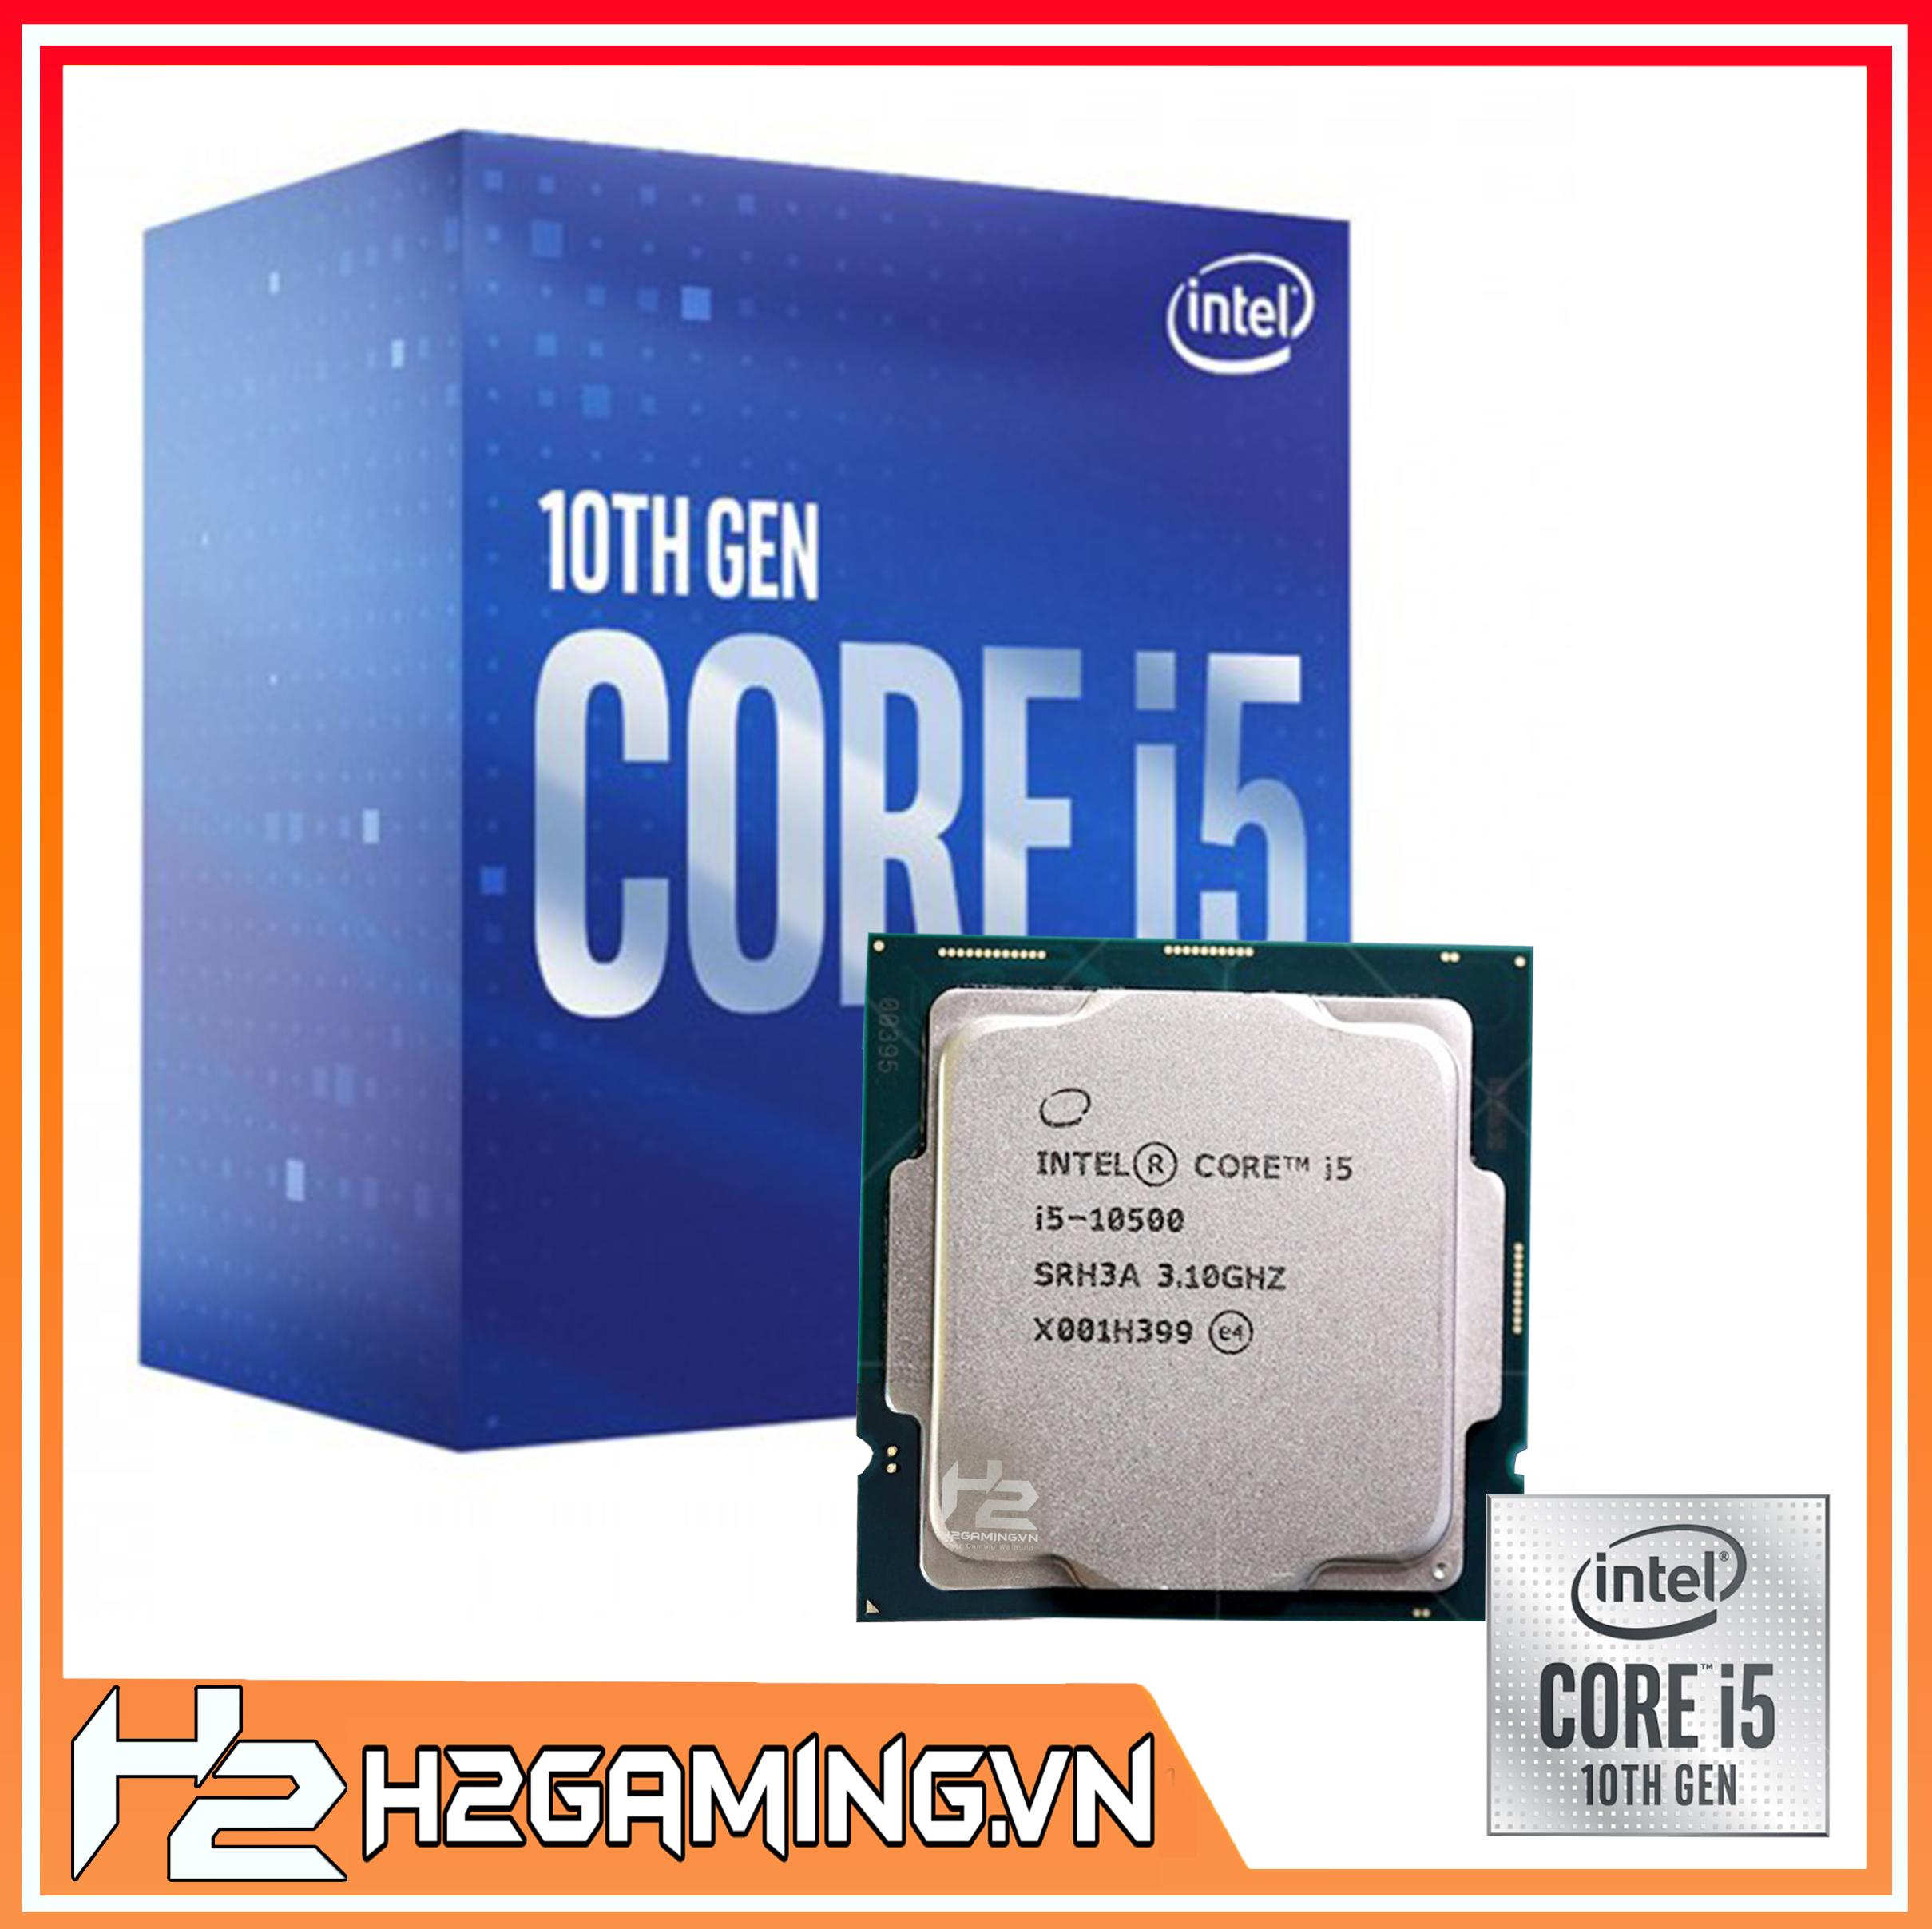 Intel_Core_i5_10500